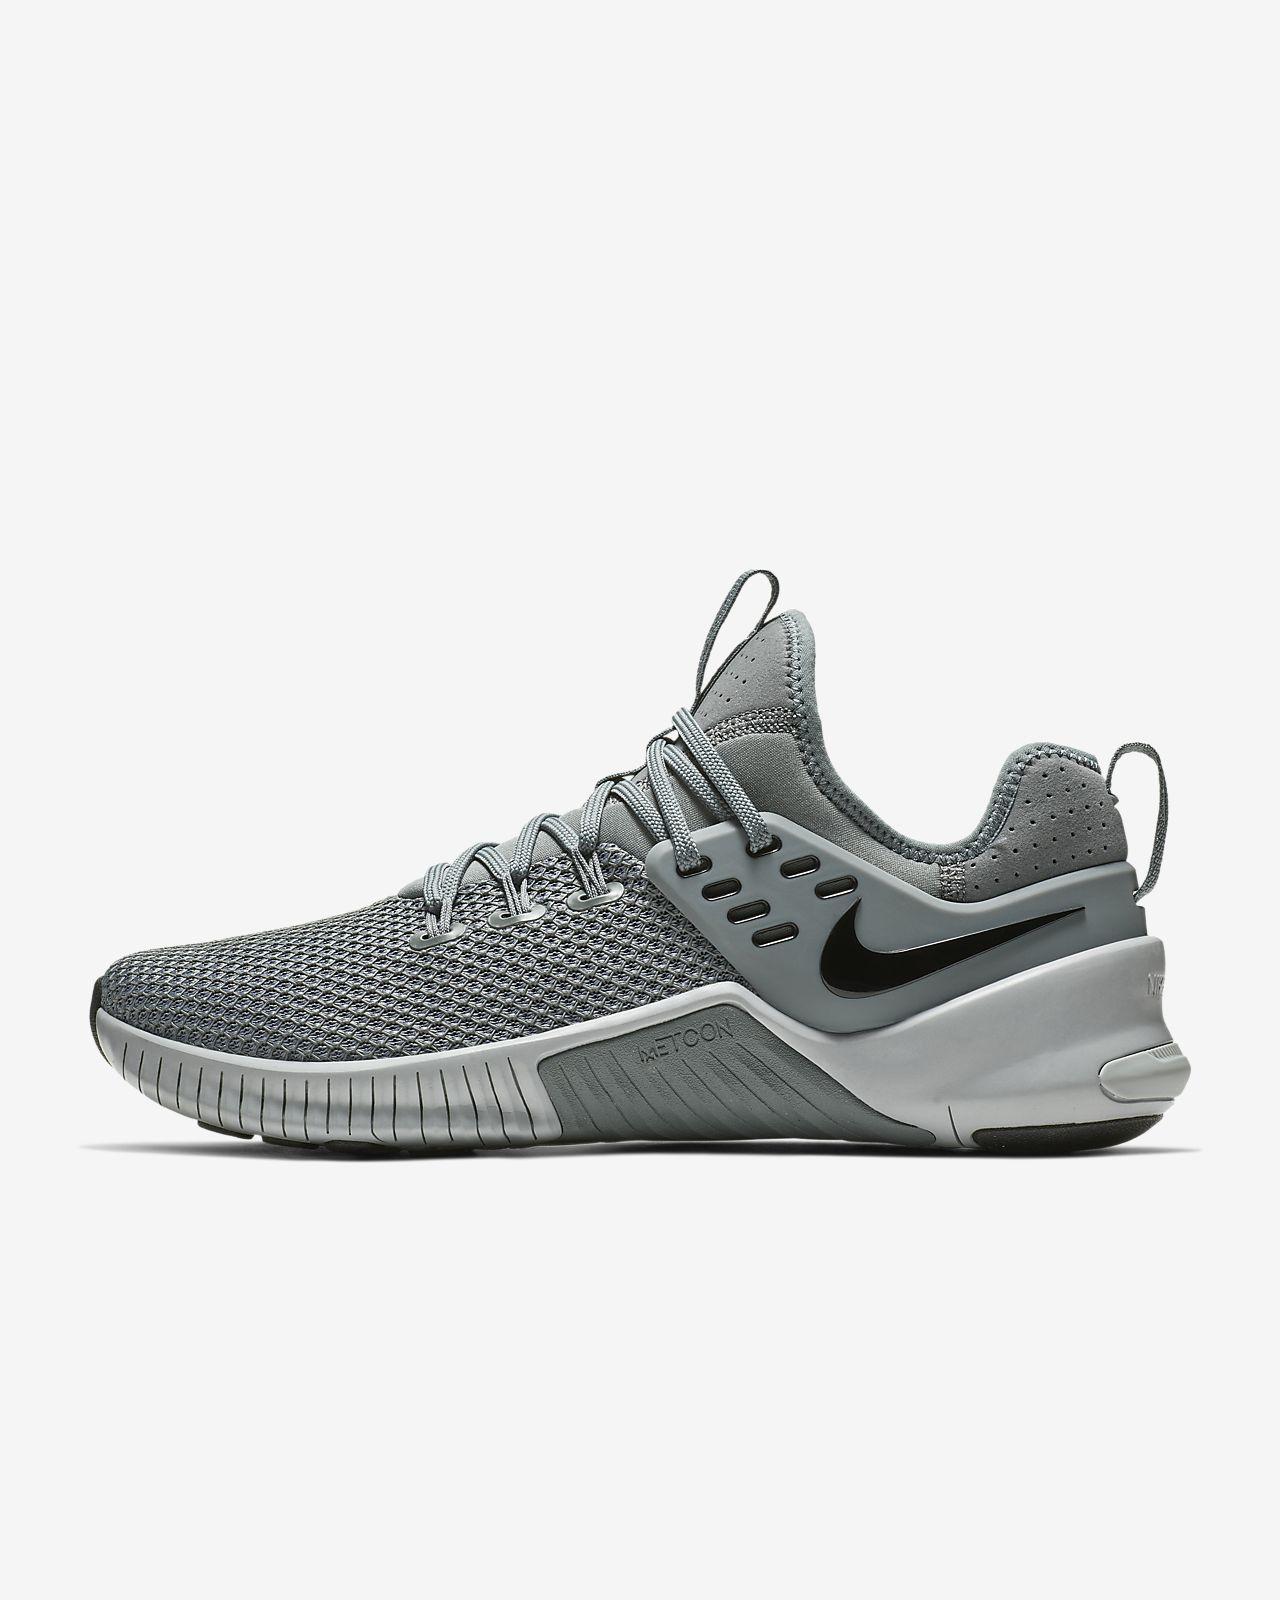 Nike Free x Metcon 交叉訓練/舉重鞋款